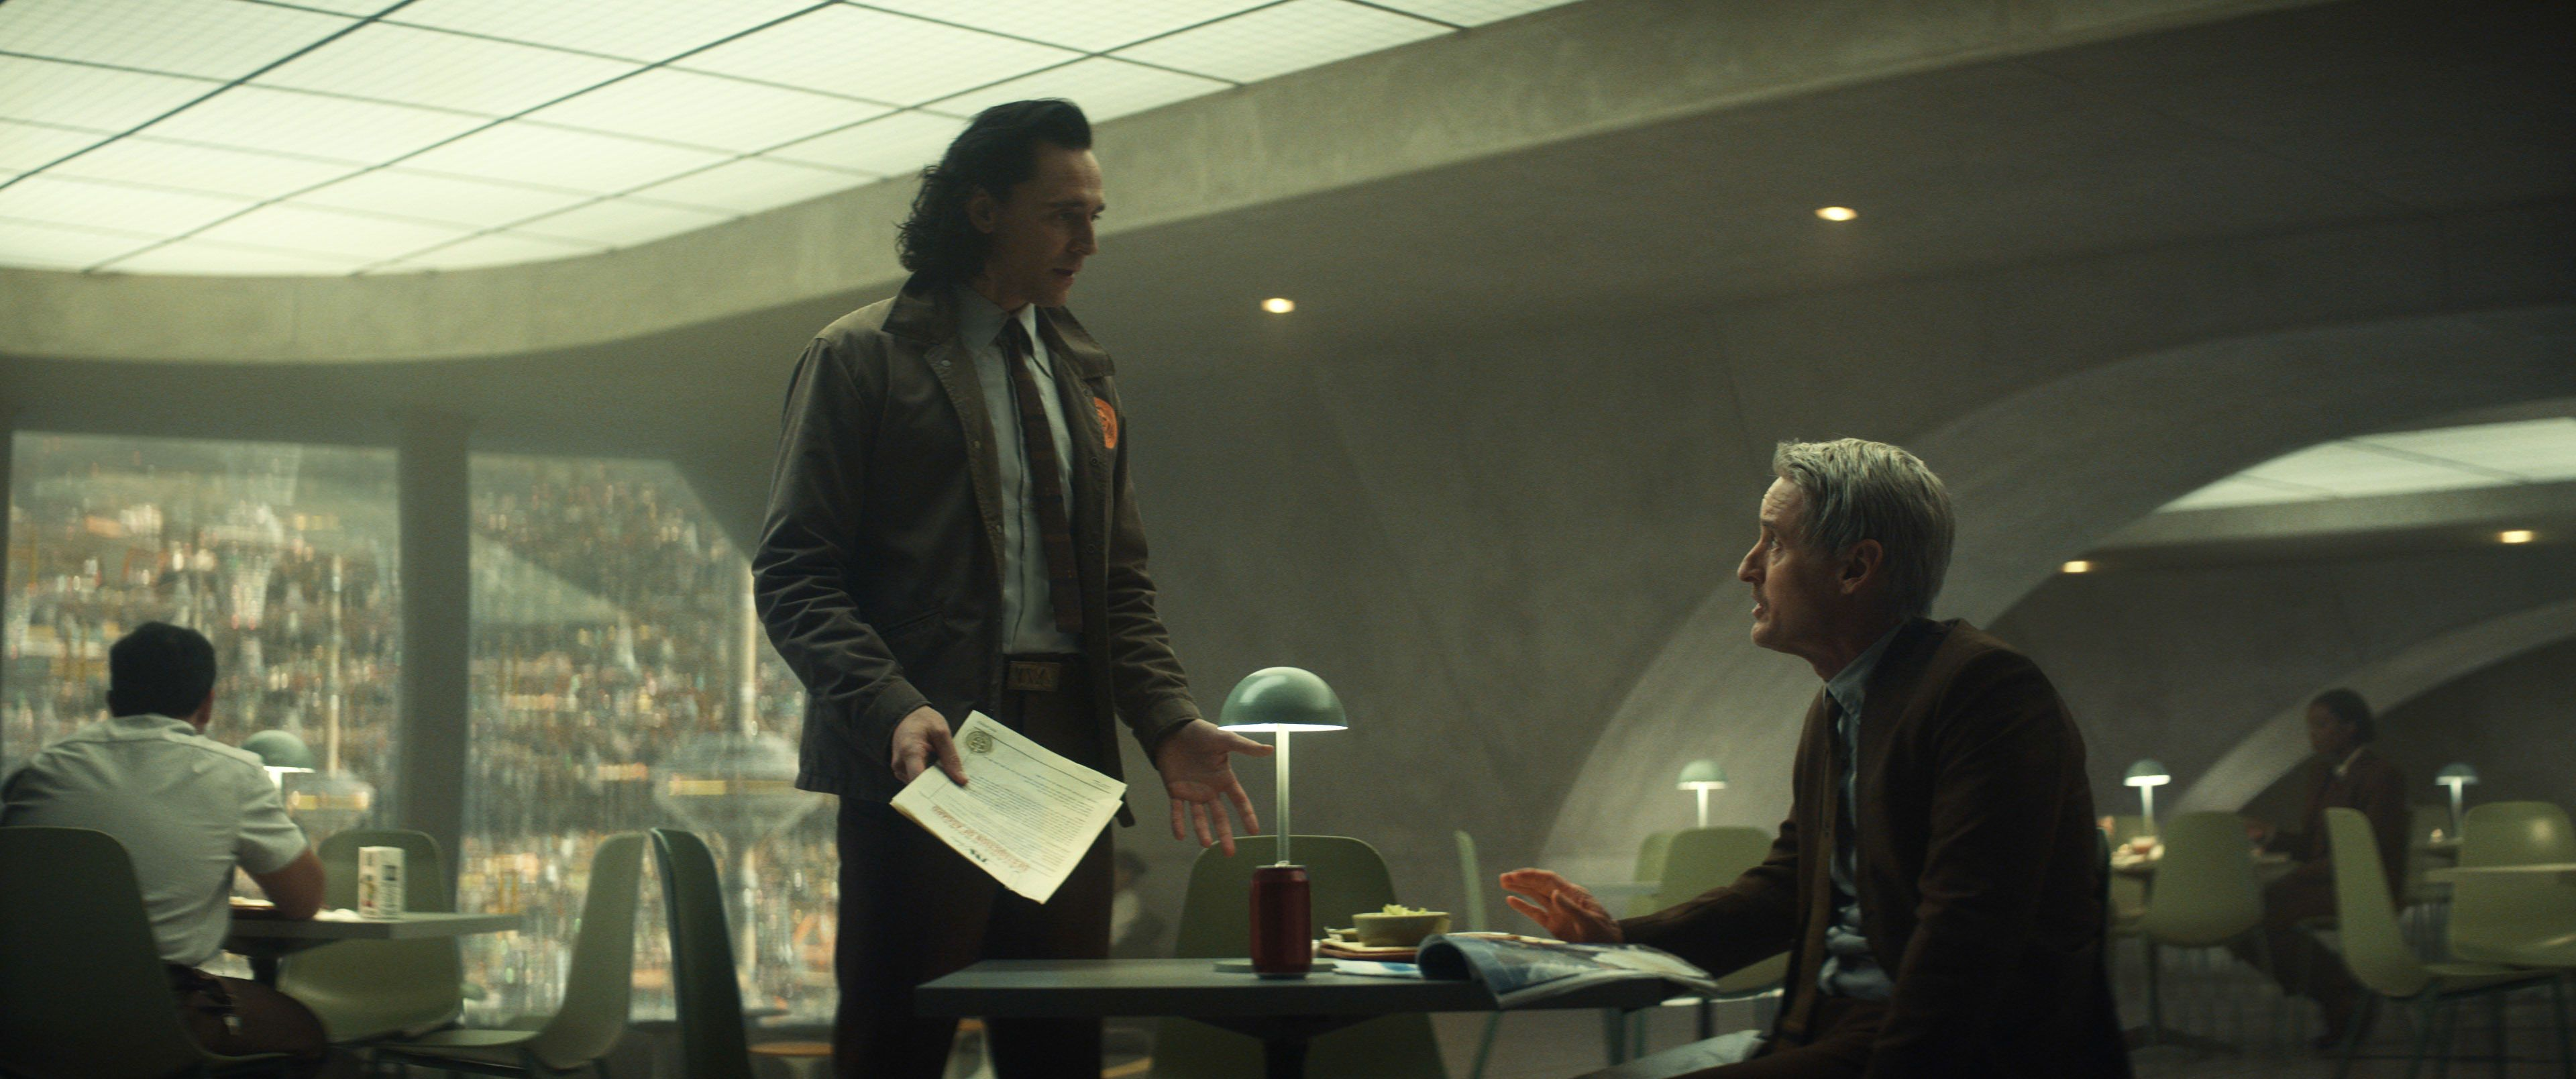 Loki Episode 2 Recap: 'The Variant'